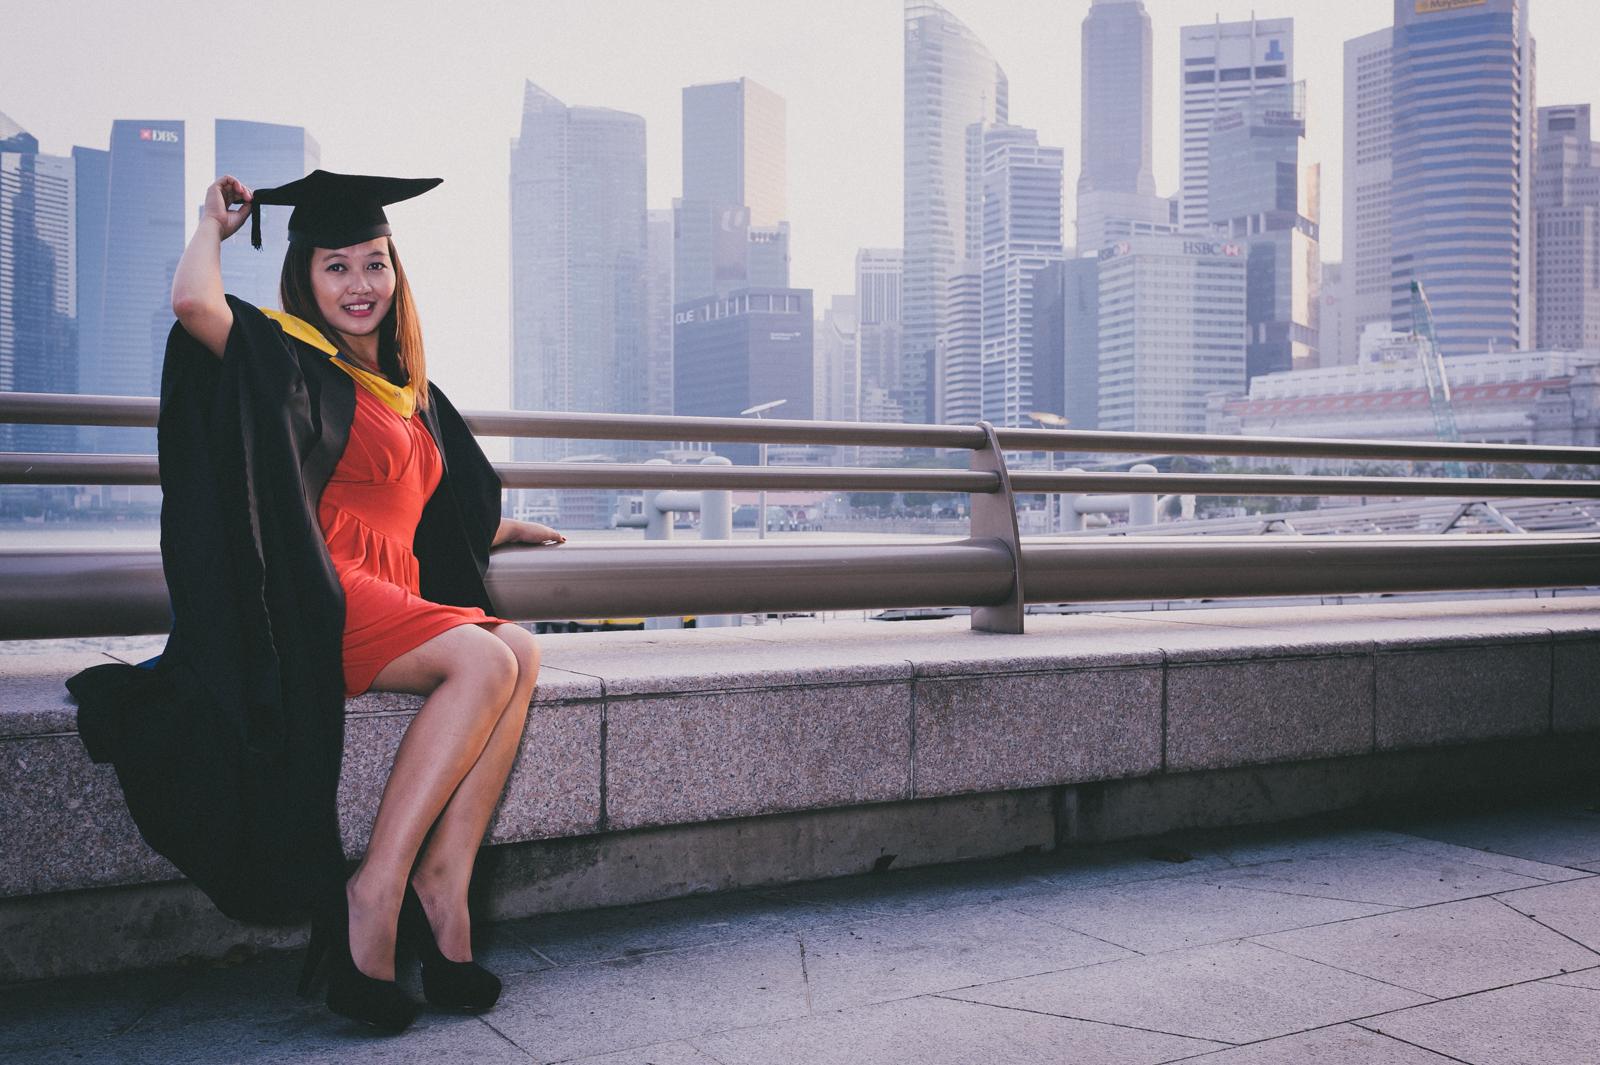 Mhay graduation #144